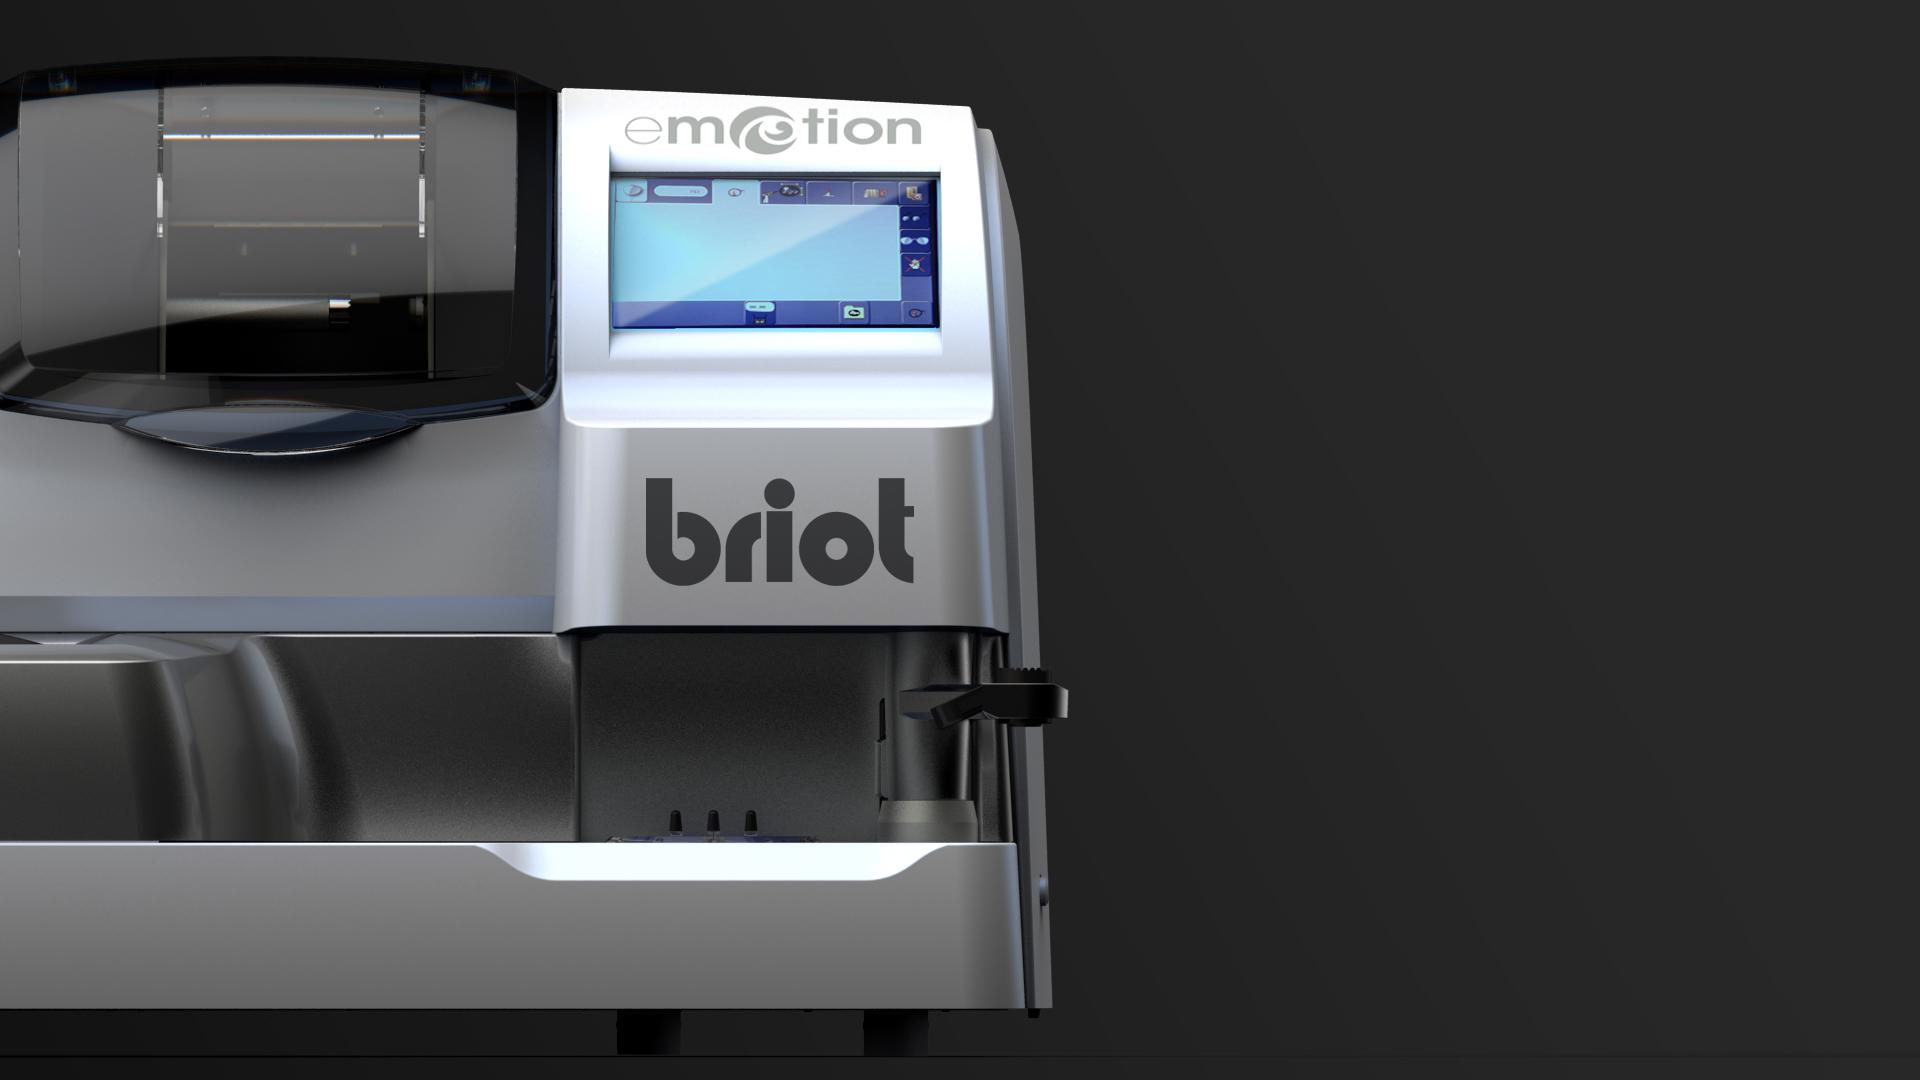 Design industriel – AdvanceDesign – briot